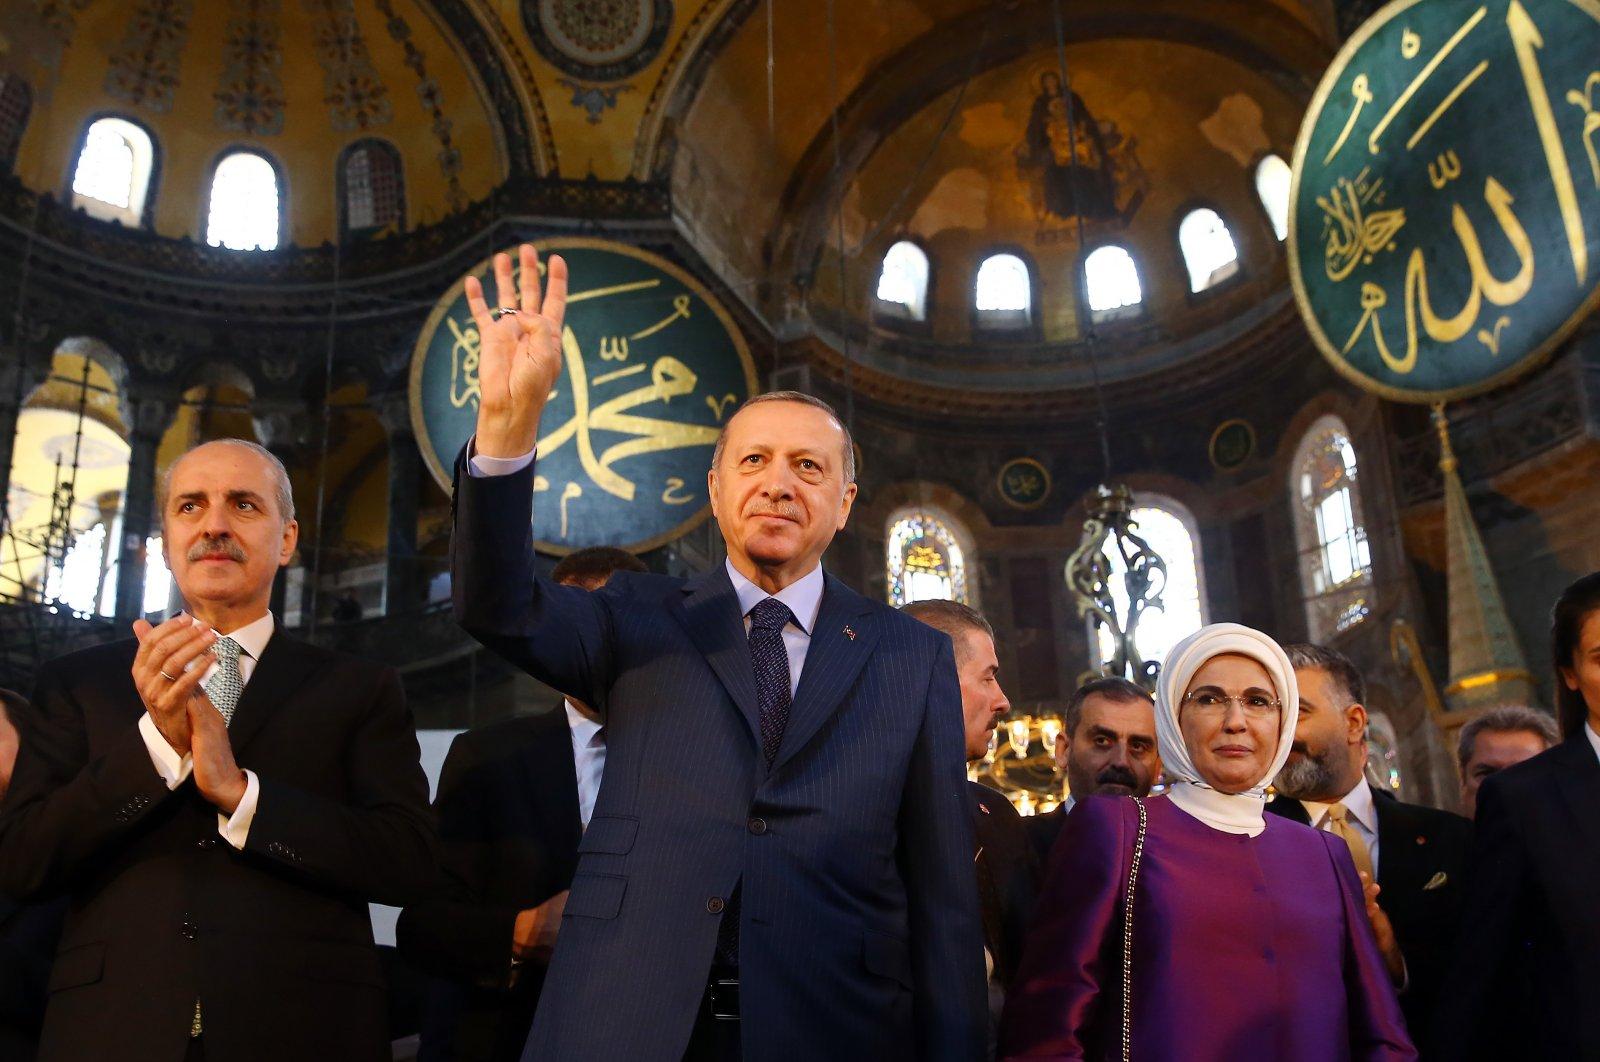 President Recep Tayyip Erdoğan gestures during a visit to Hagia Sophia, in Istanbul, Turkey, March 31, 2018. (AA Photo)